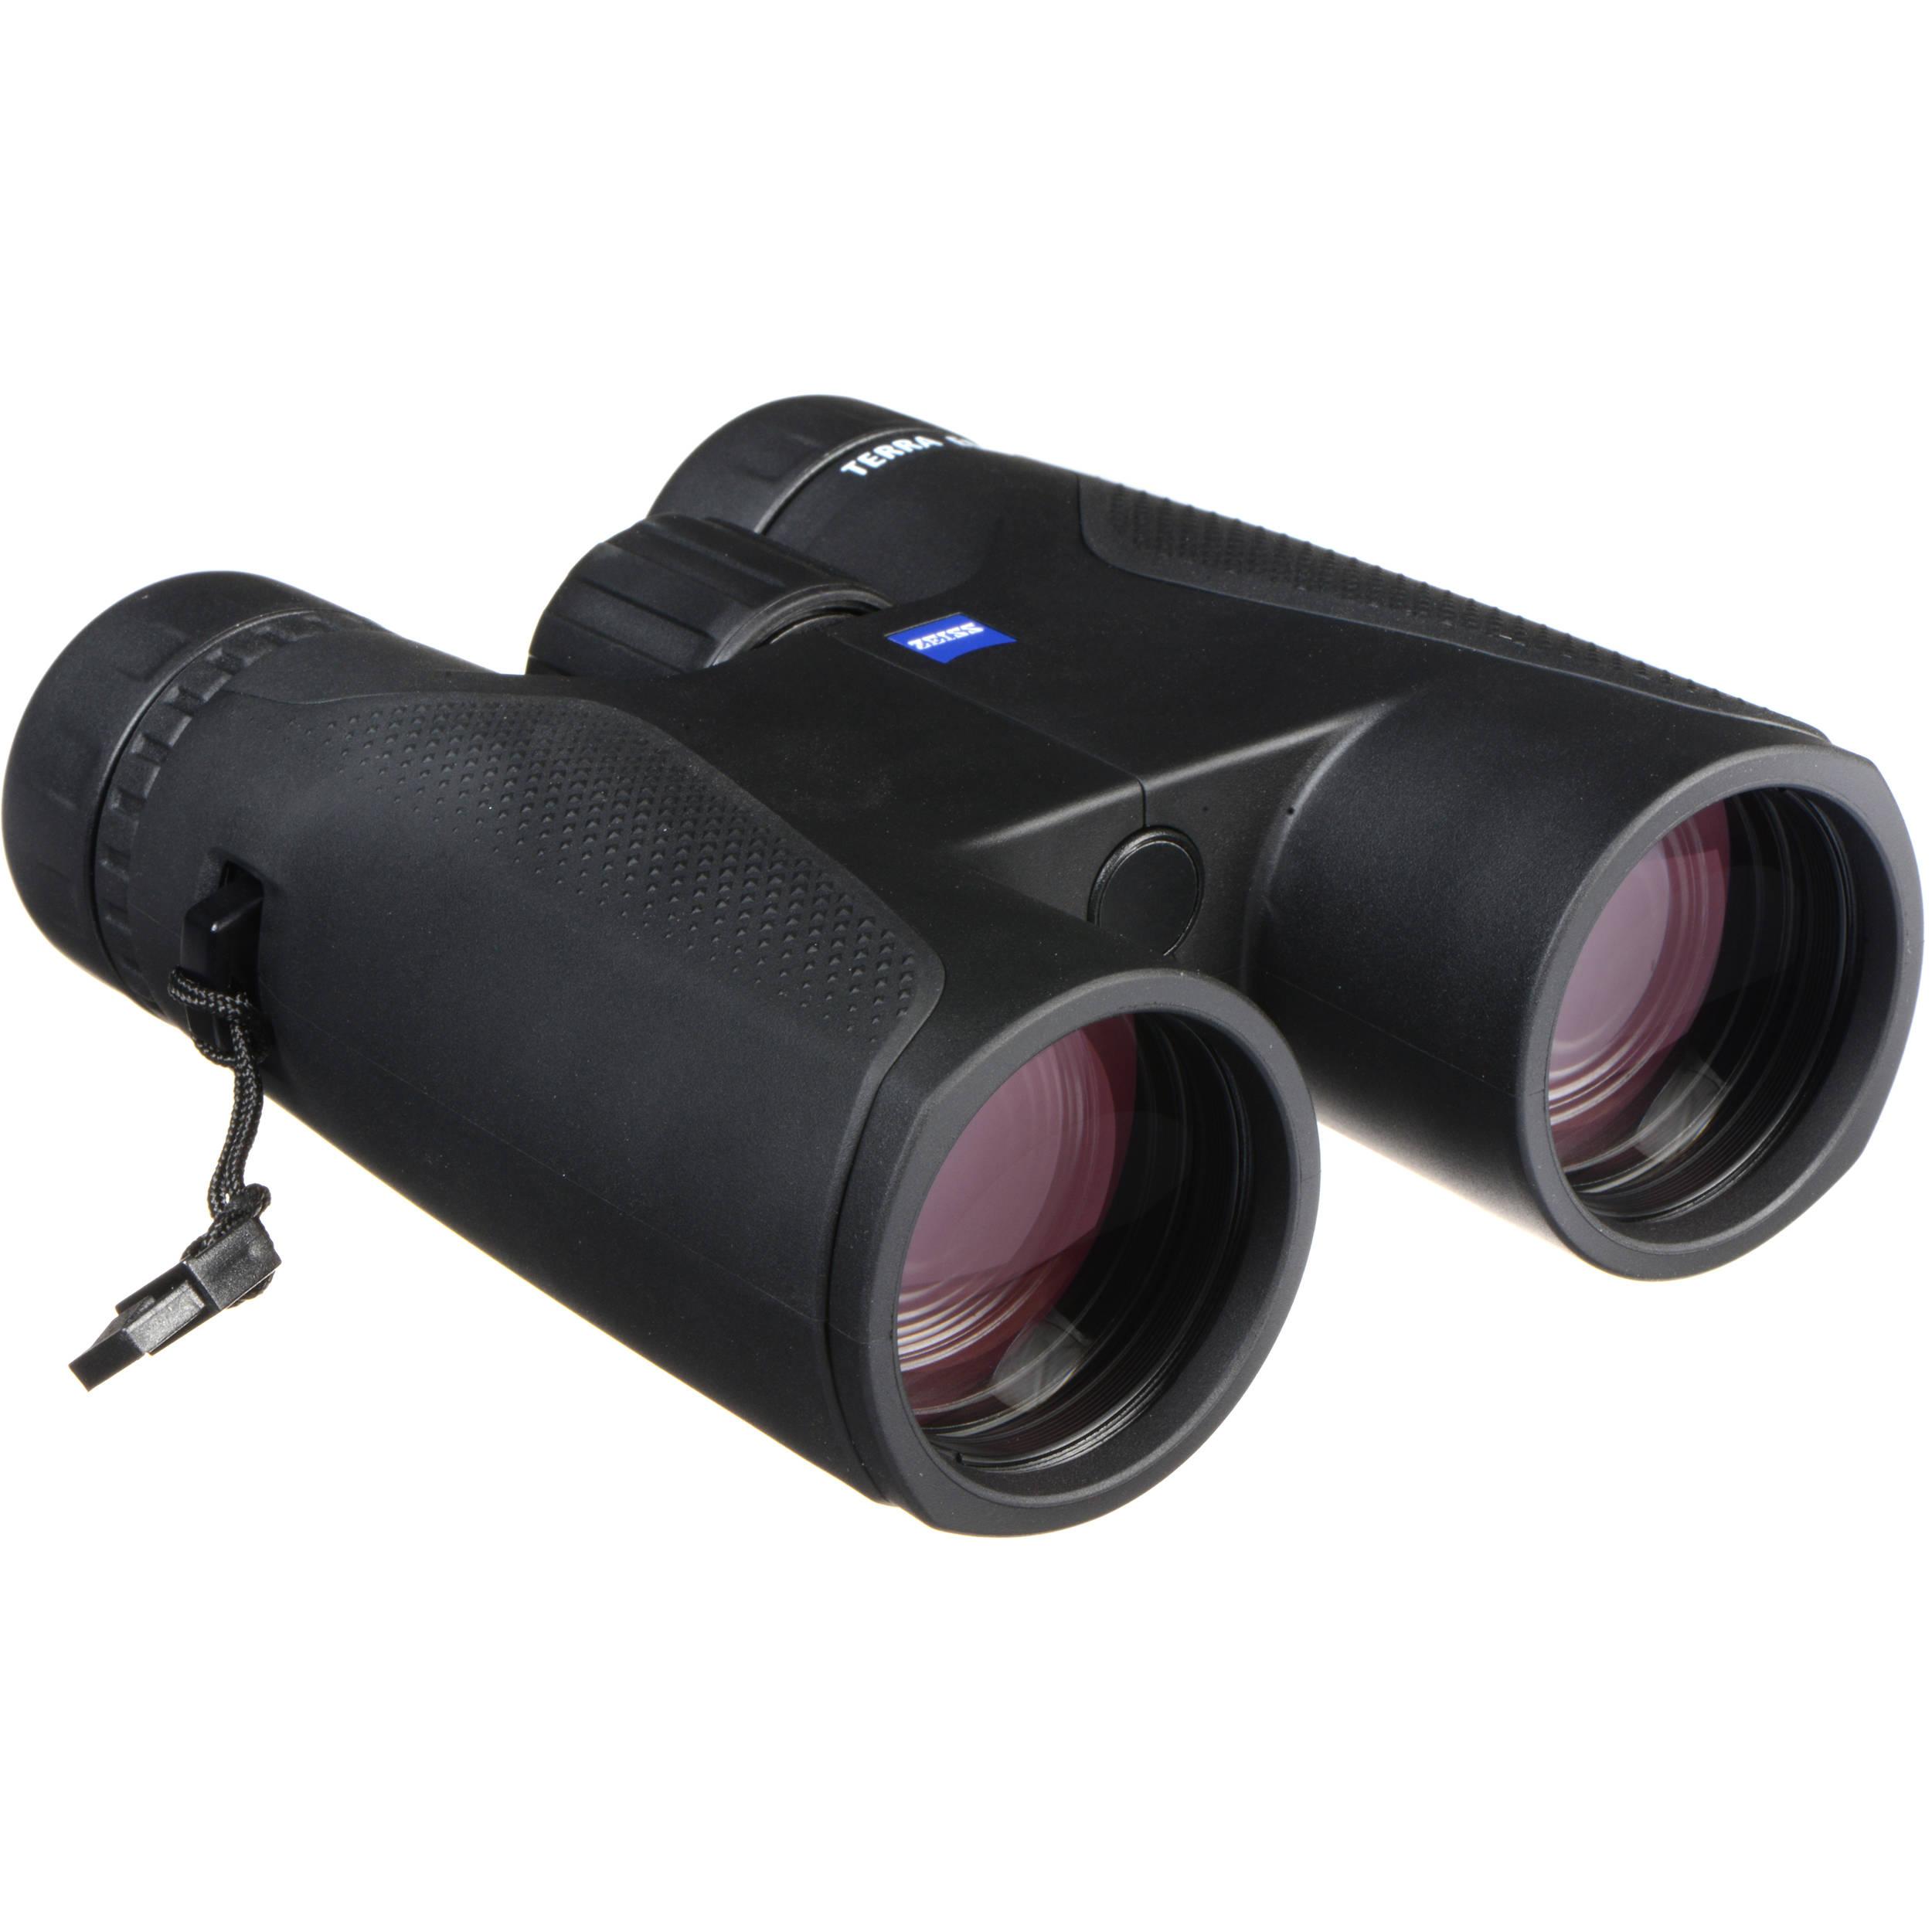 Zeiss 10X42 Terra Ed Binoculars (Gray) 524204-9907-000 B&Amp;H Photo